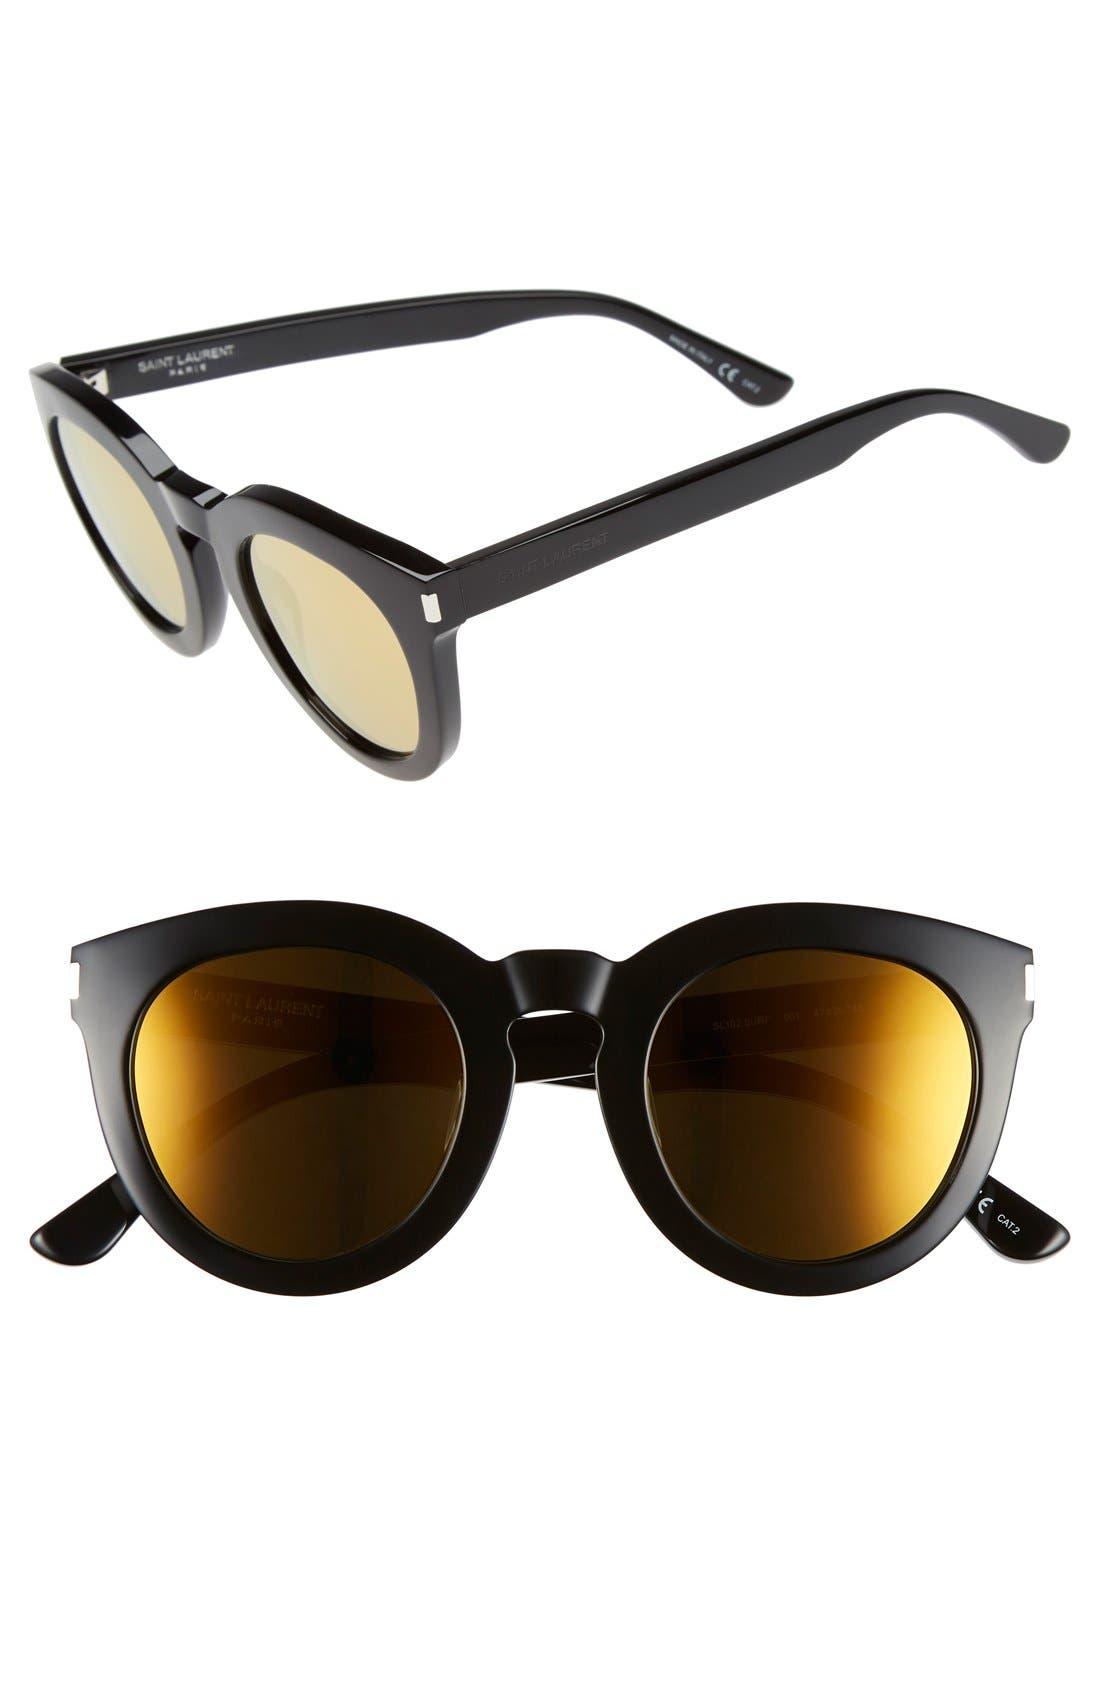 Main Image - Saint Laurent '102 Surf' 47mm Retro Sunglasses